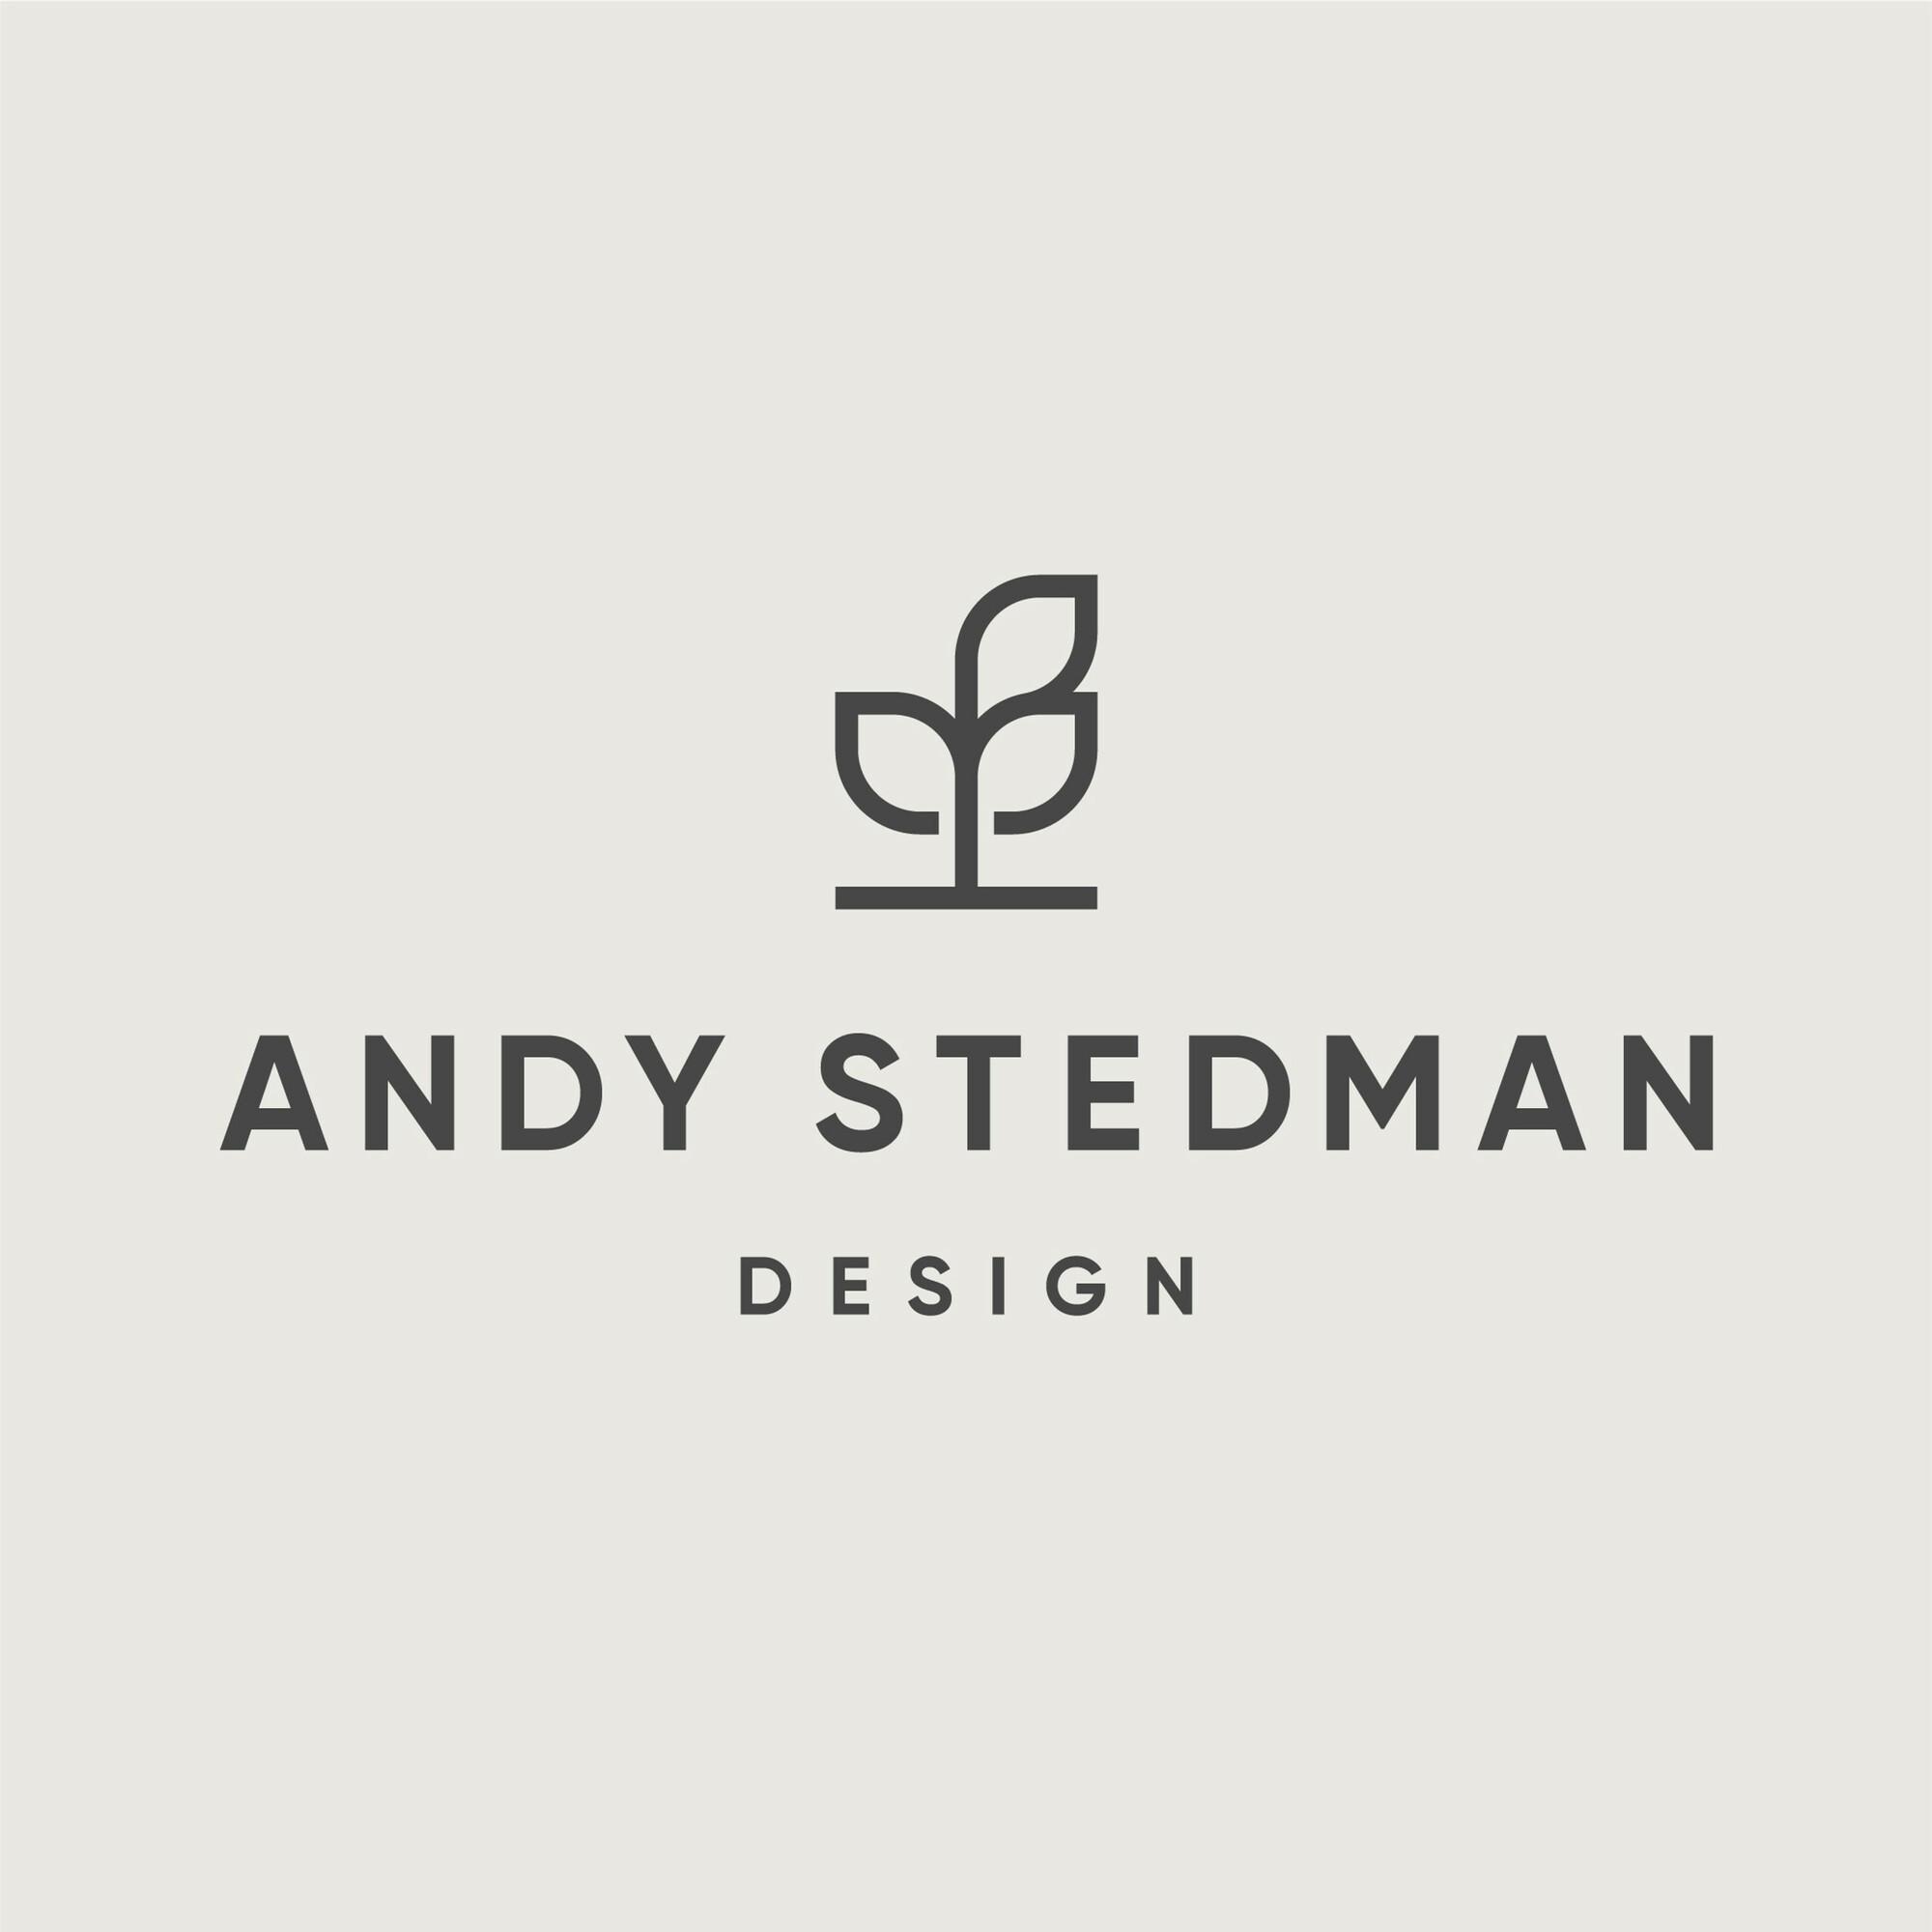 Andy Stedman Design